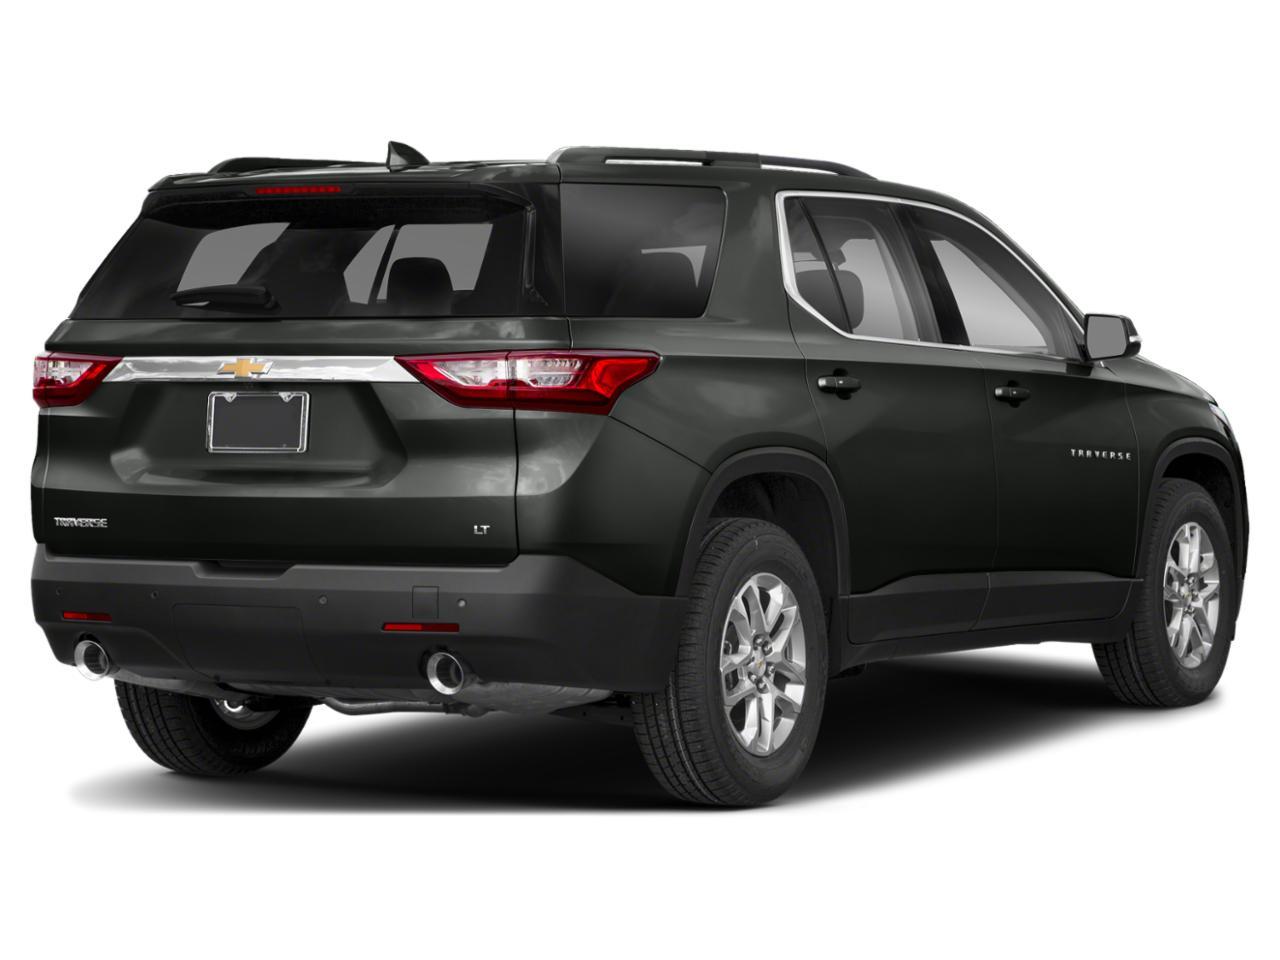 2019 Chevrolet Traverse LT LEATHER SUV Slide